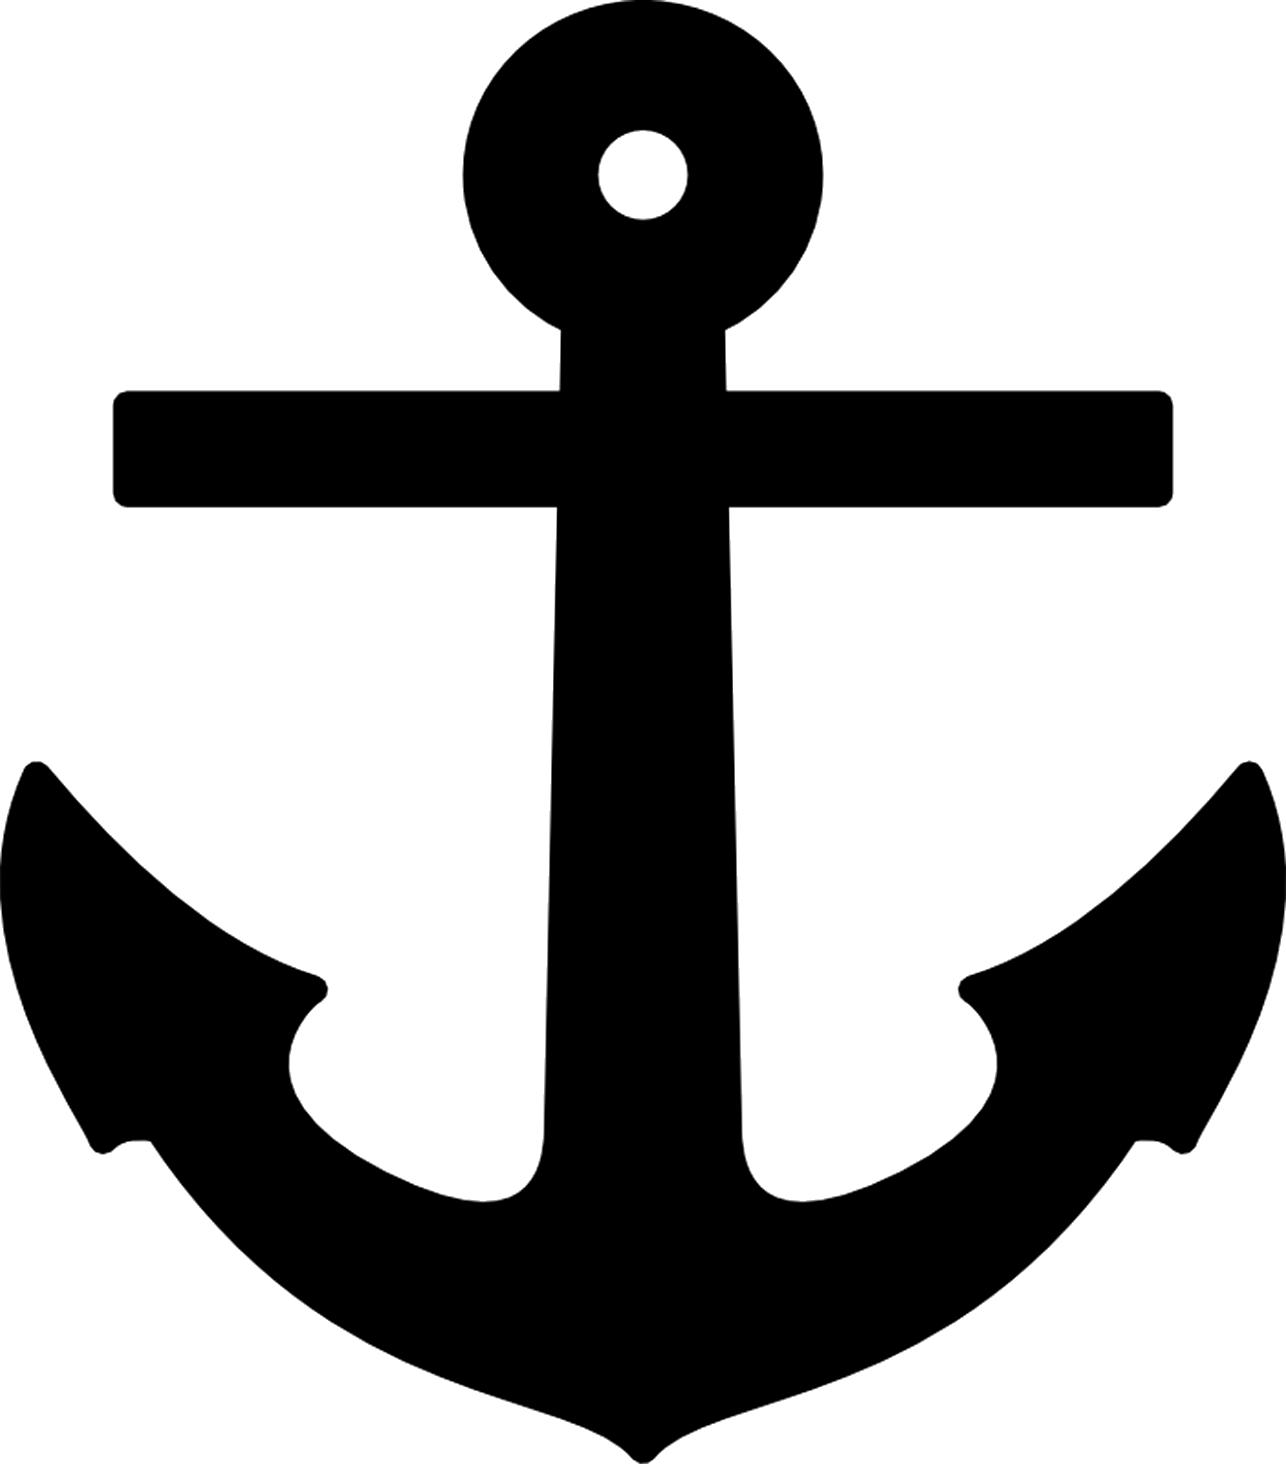 Anchor Png Image Anchor Png Image Engraving